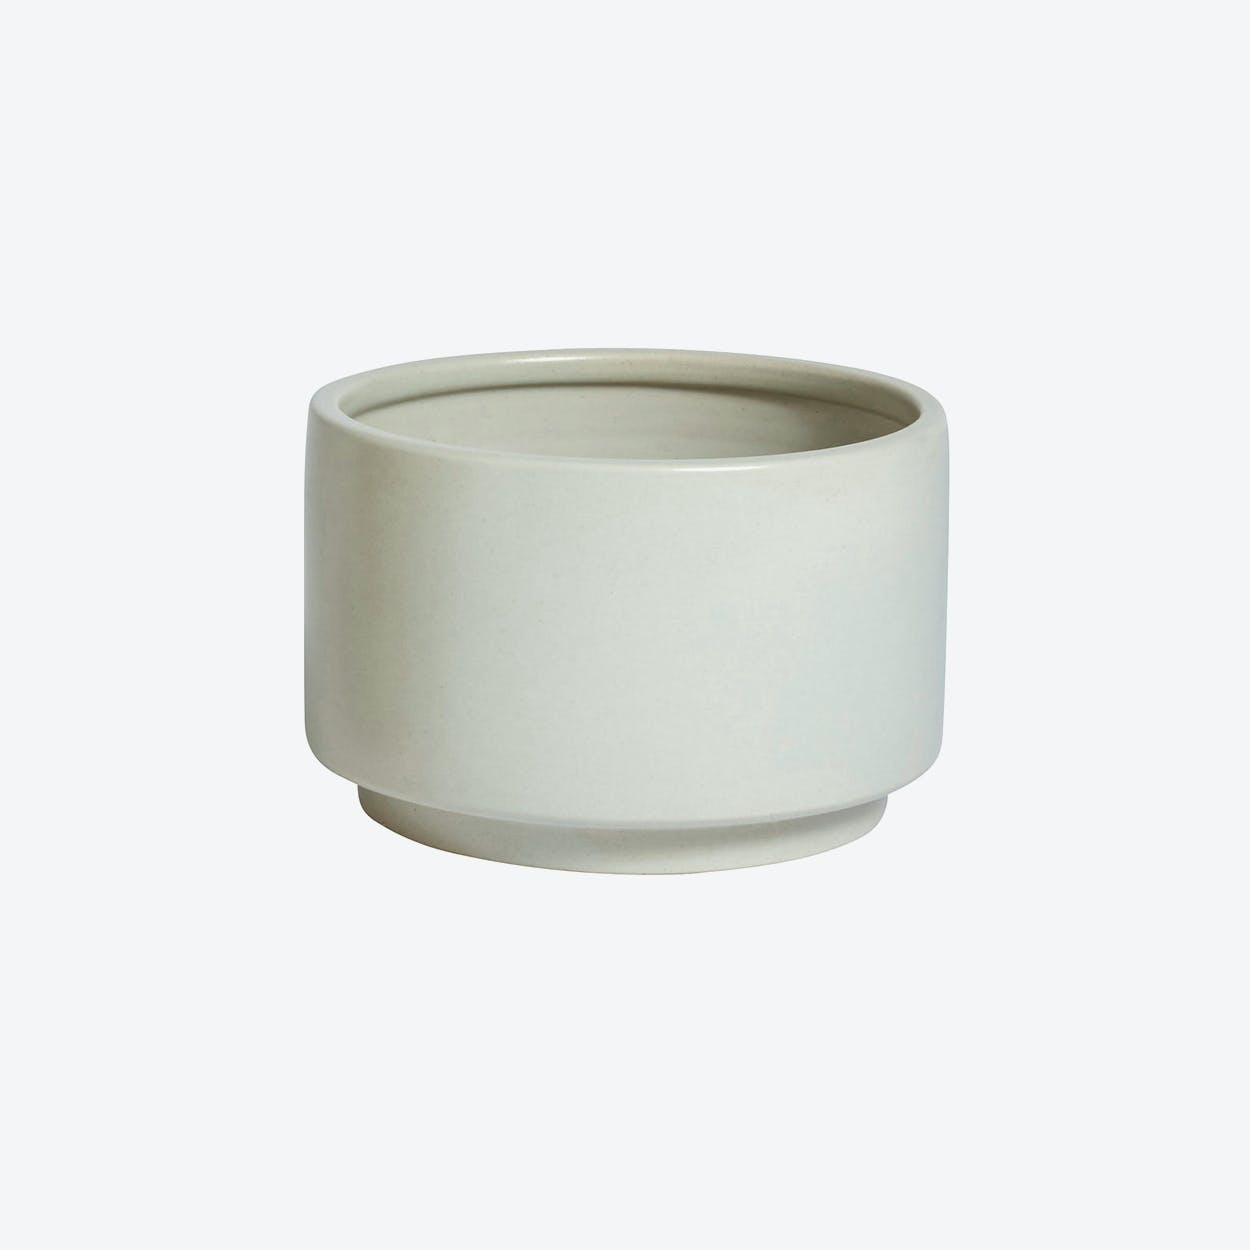 Kana Pots Large in White